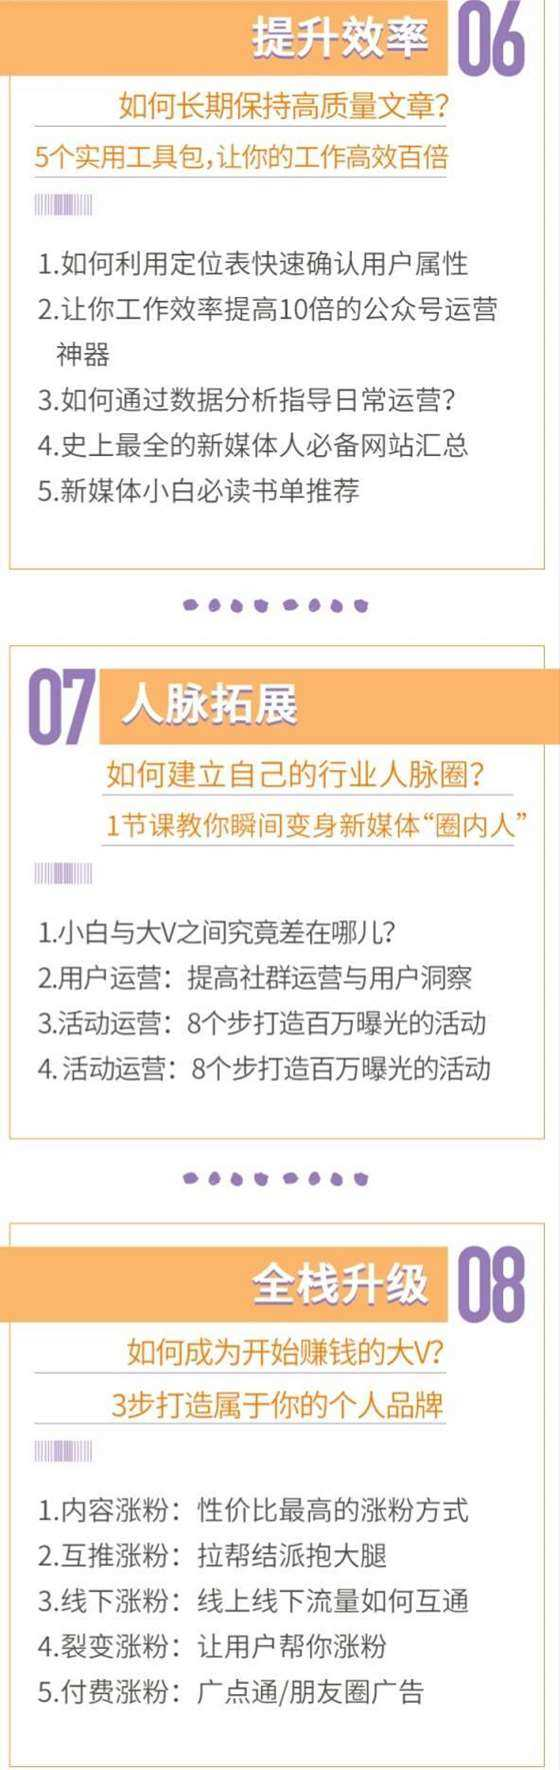 http://www.huodongxing.com/file/20160530/5092341960349/643183162733571.jpg